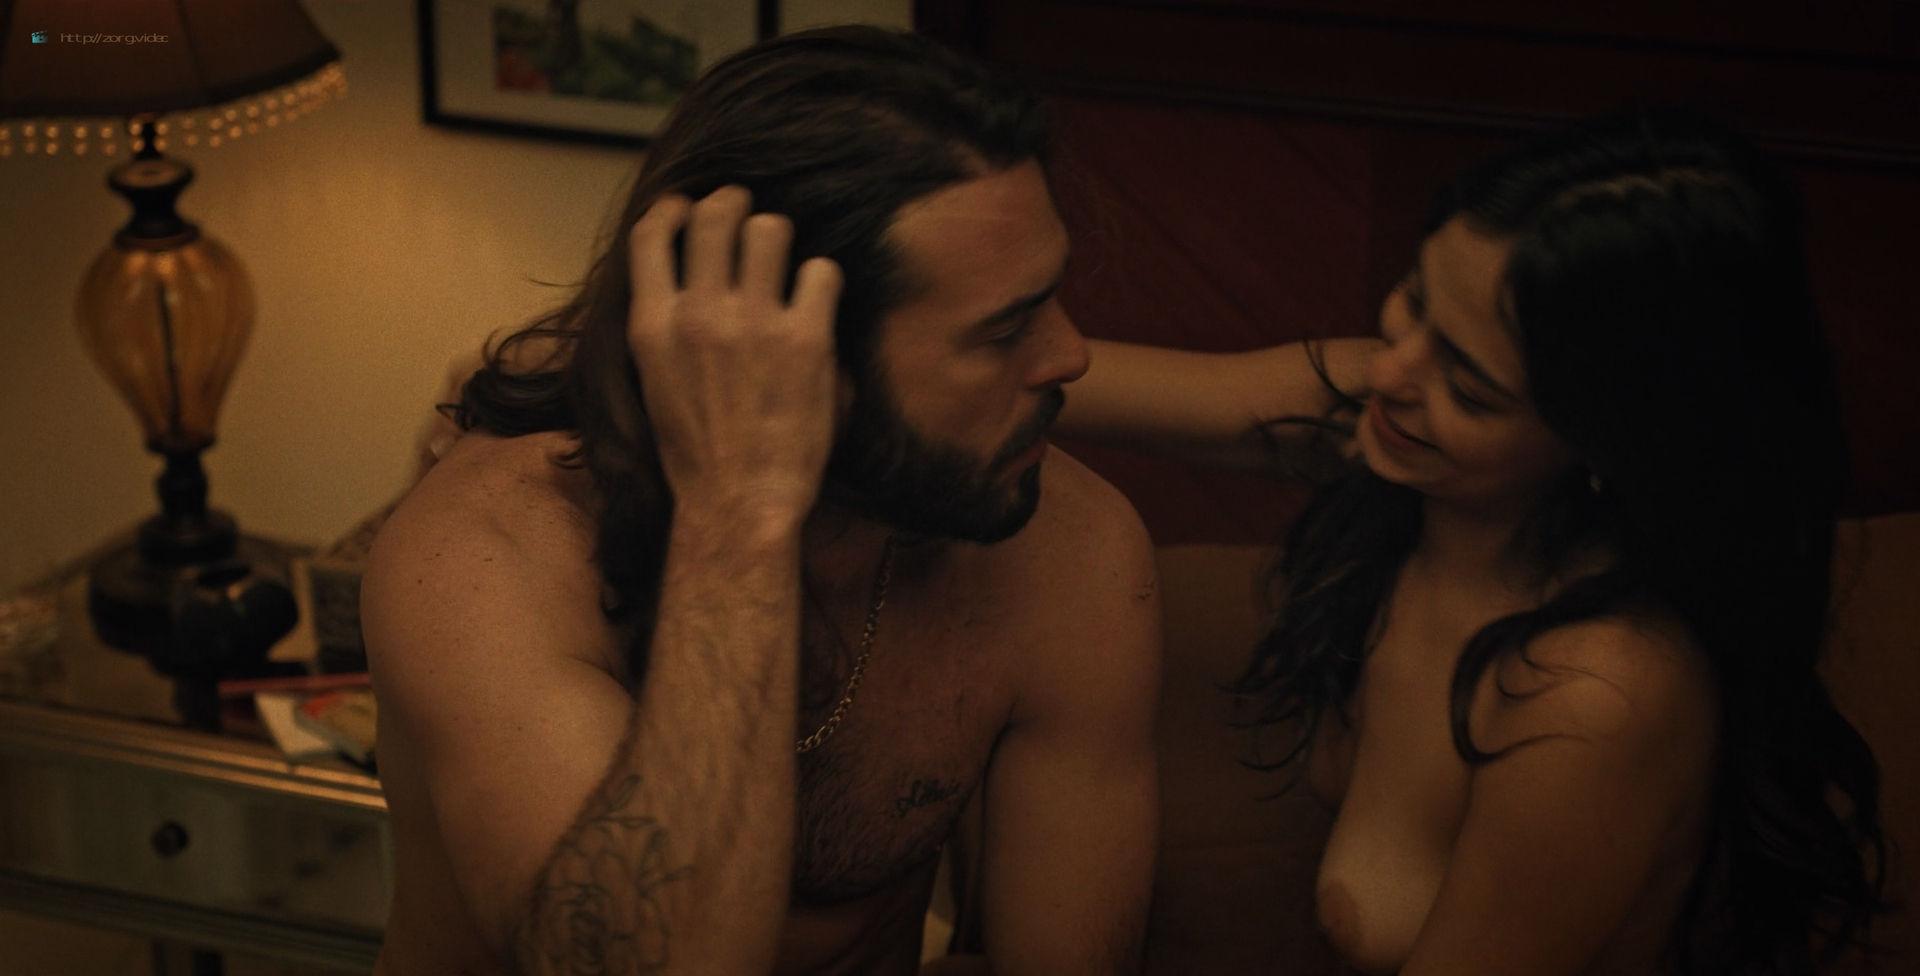 Ana Layevska nude lesbian sex with Florencia Ríos - Yankee (2019) S1 HD 1080p (2)